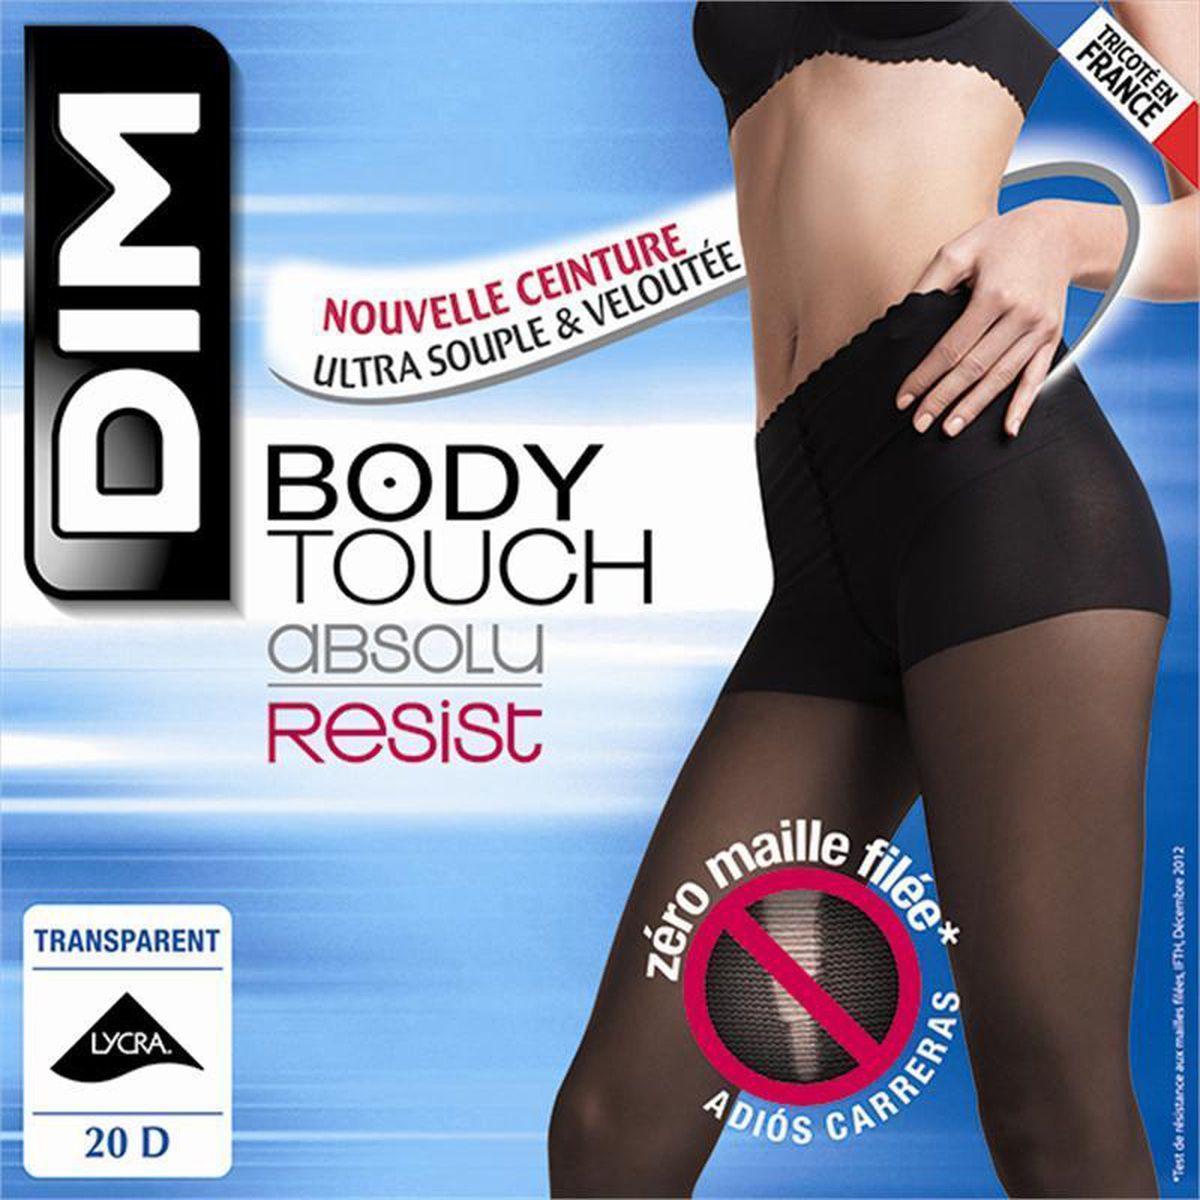 Dim Collant Body Touch Absolu Resist transparent Noir 9d01b4a6022